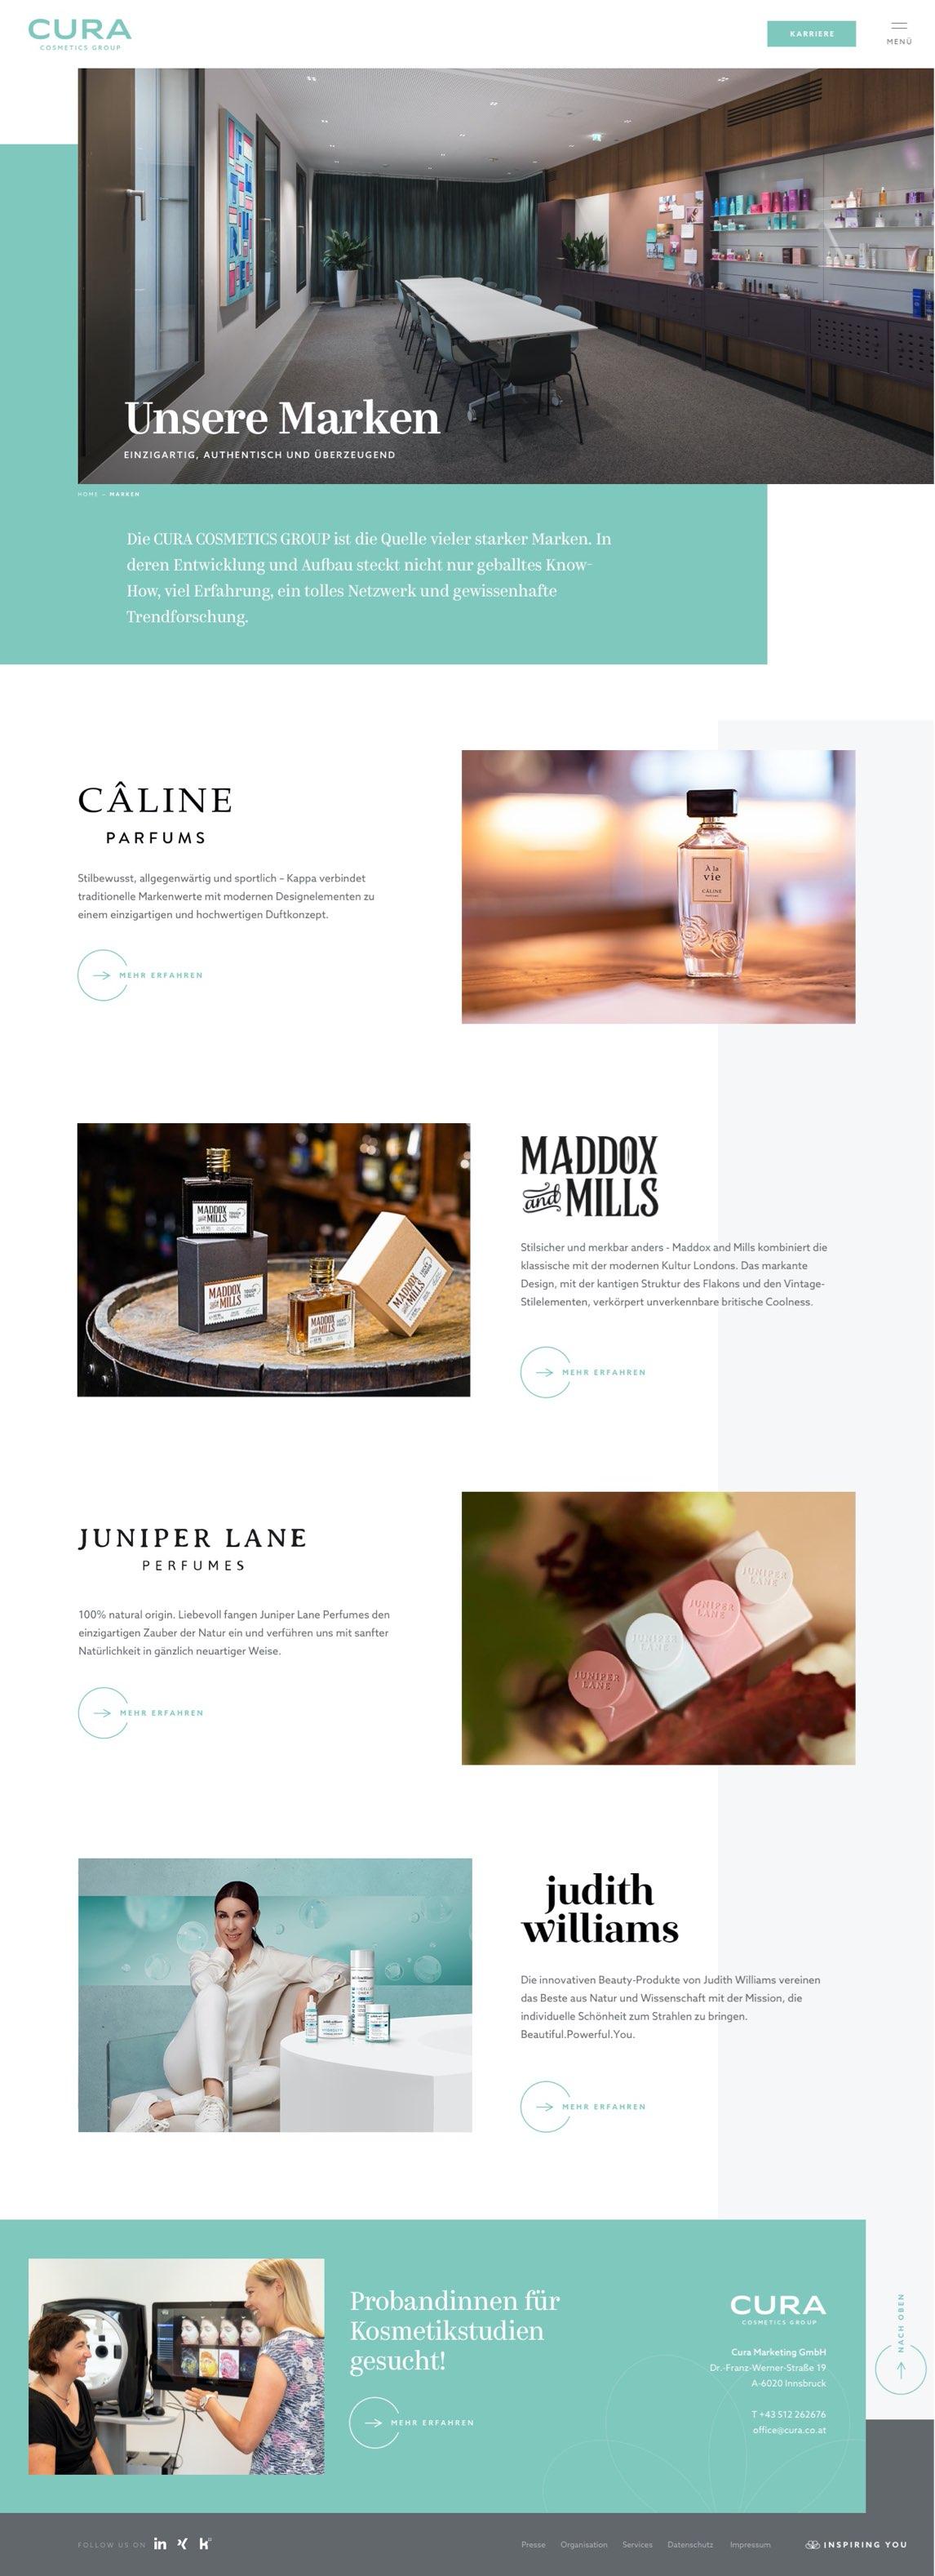 Cura Cosmetics - Webdesign